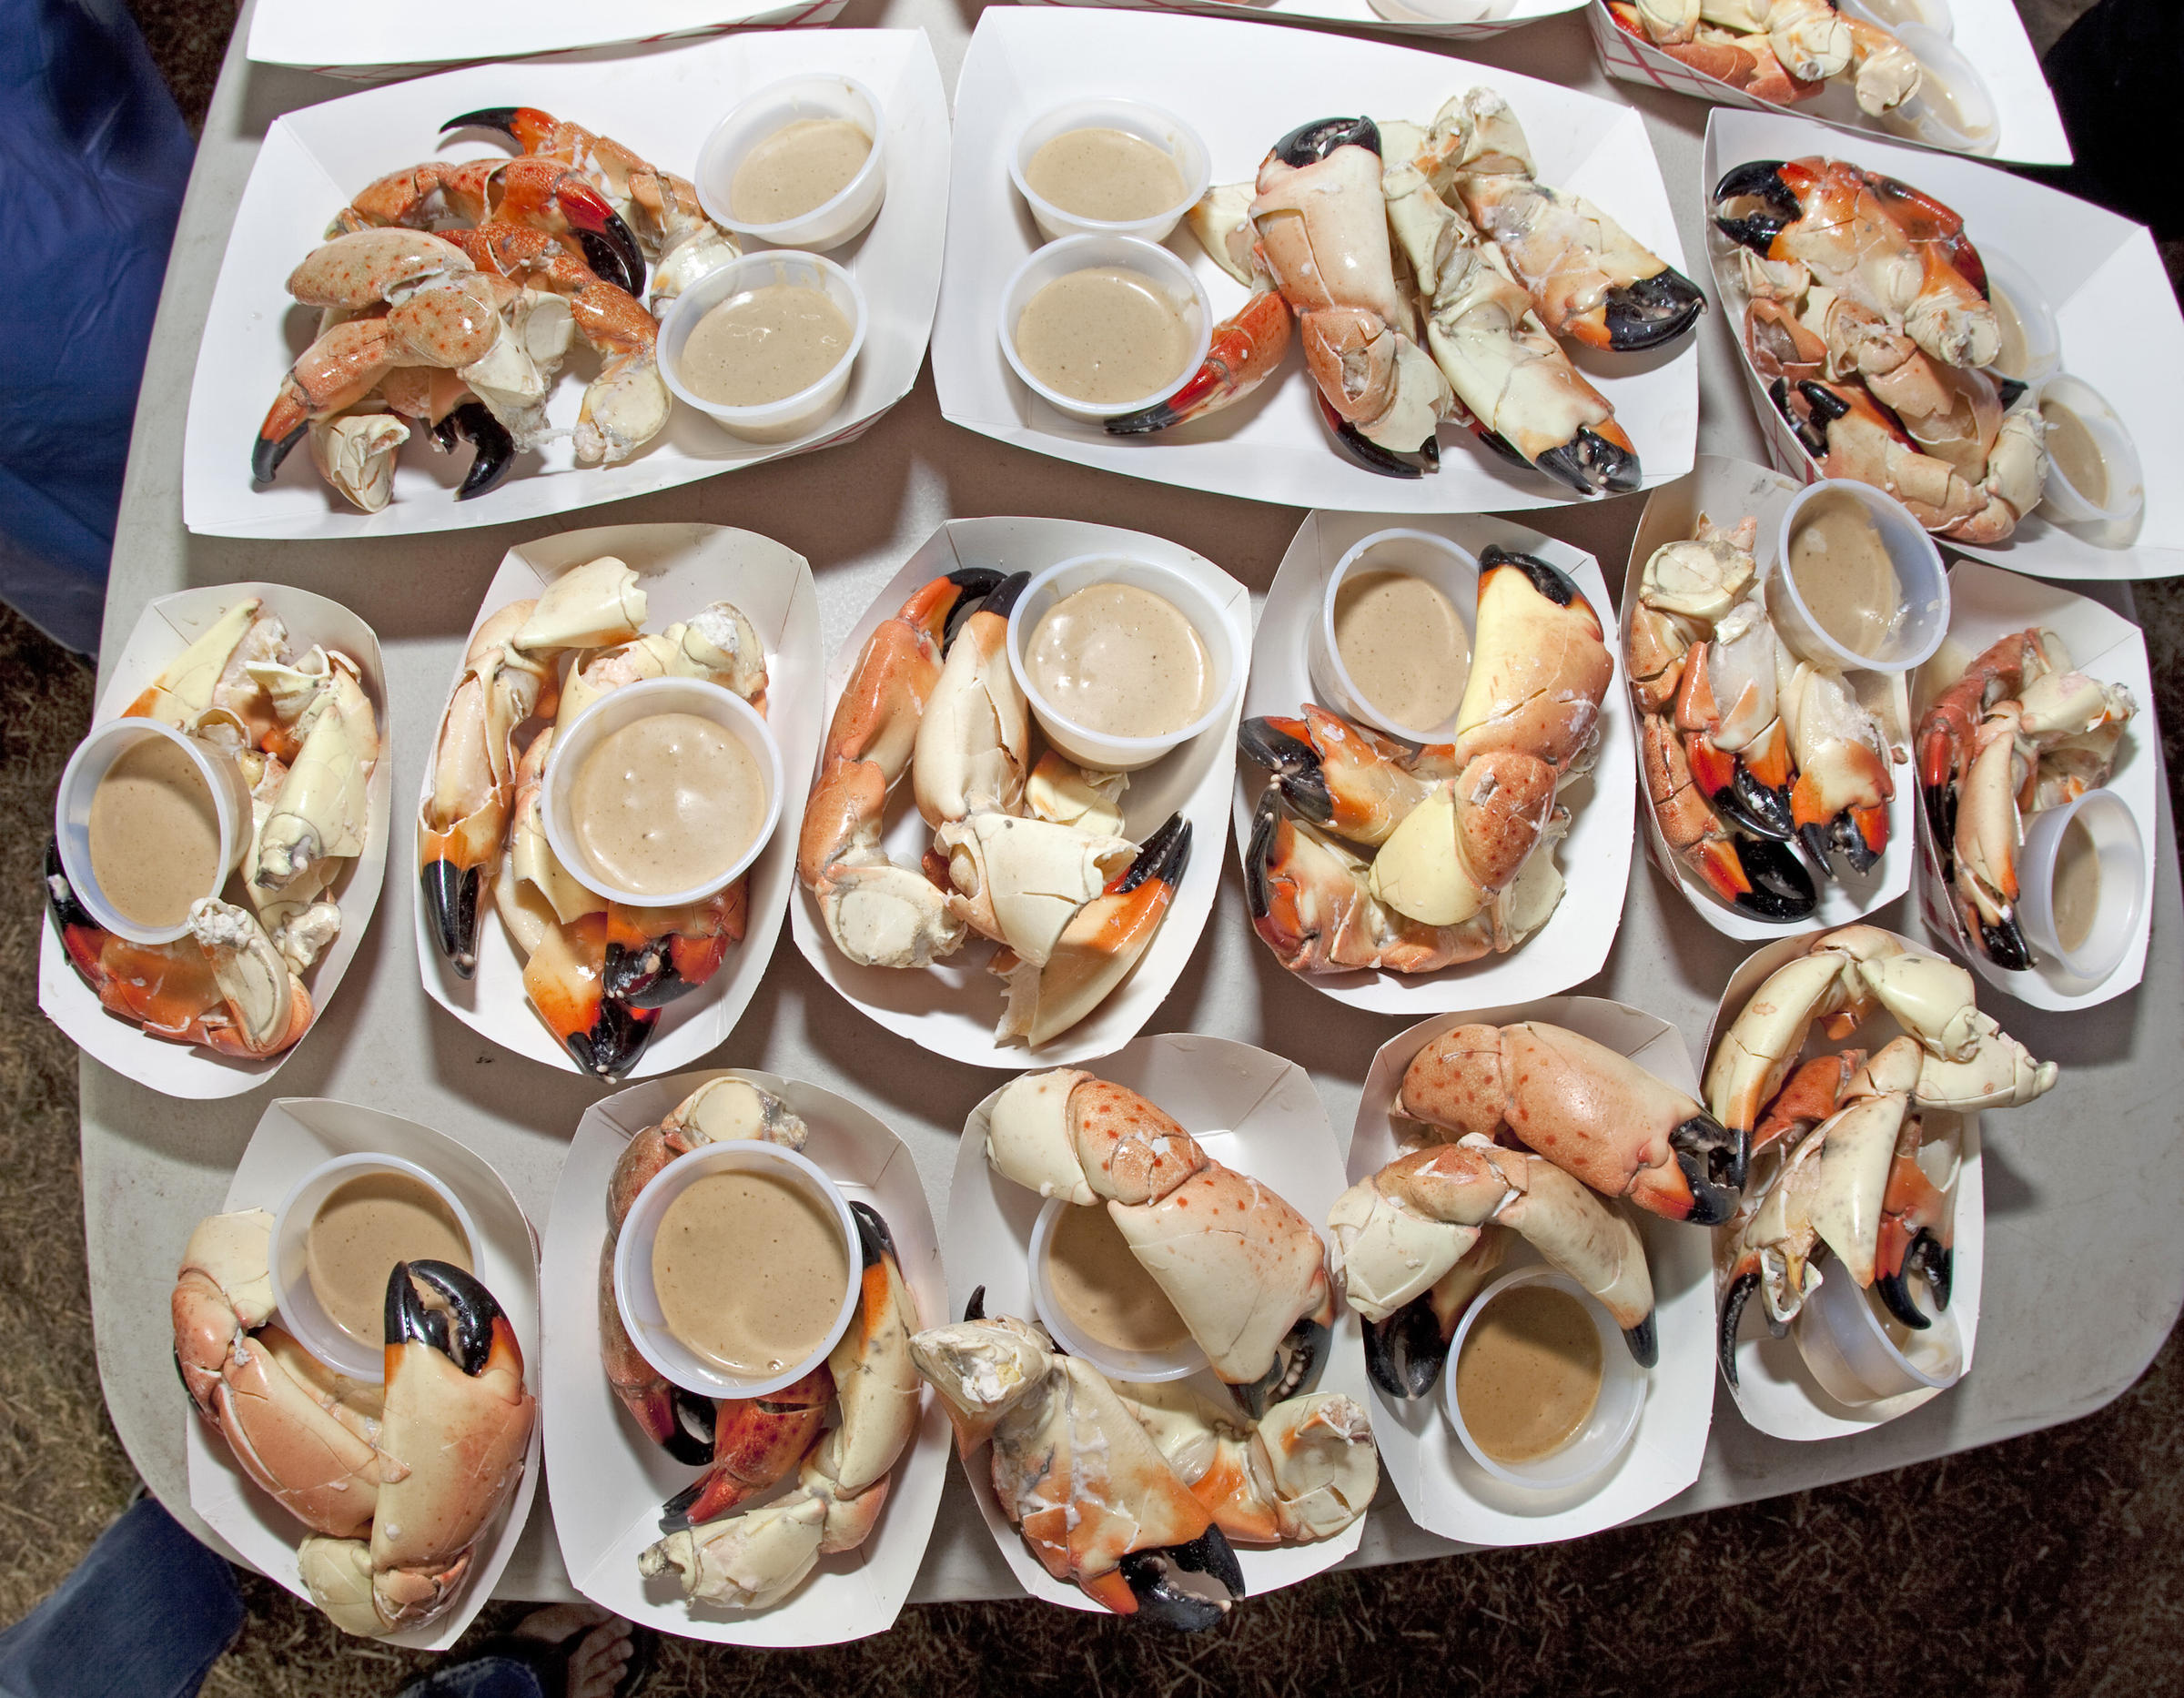 stone_crab_bob_care.jpg